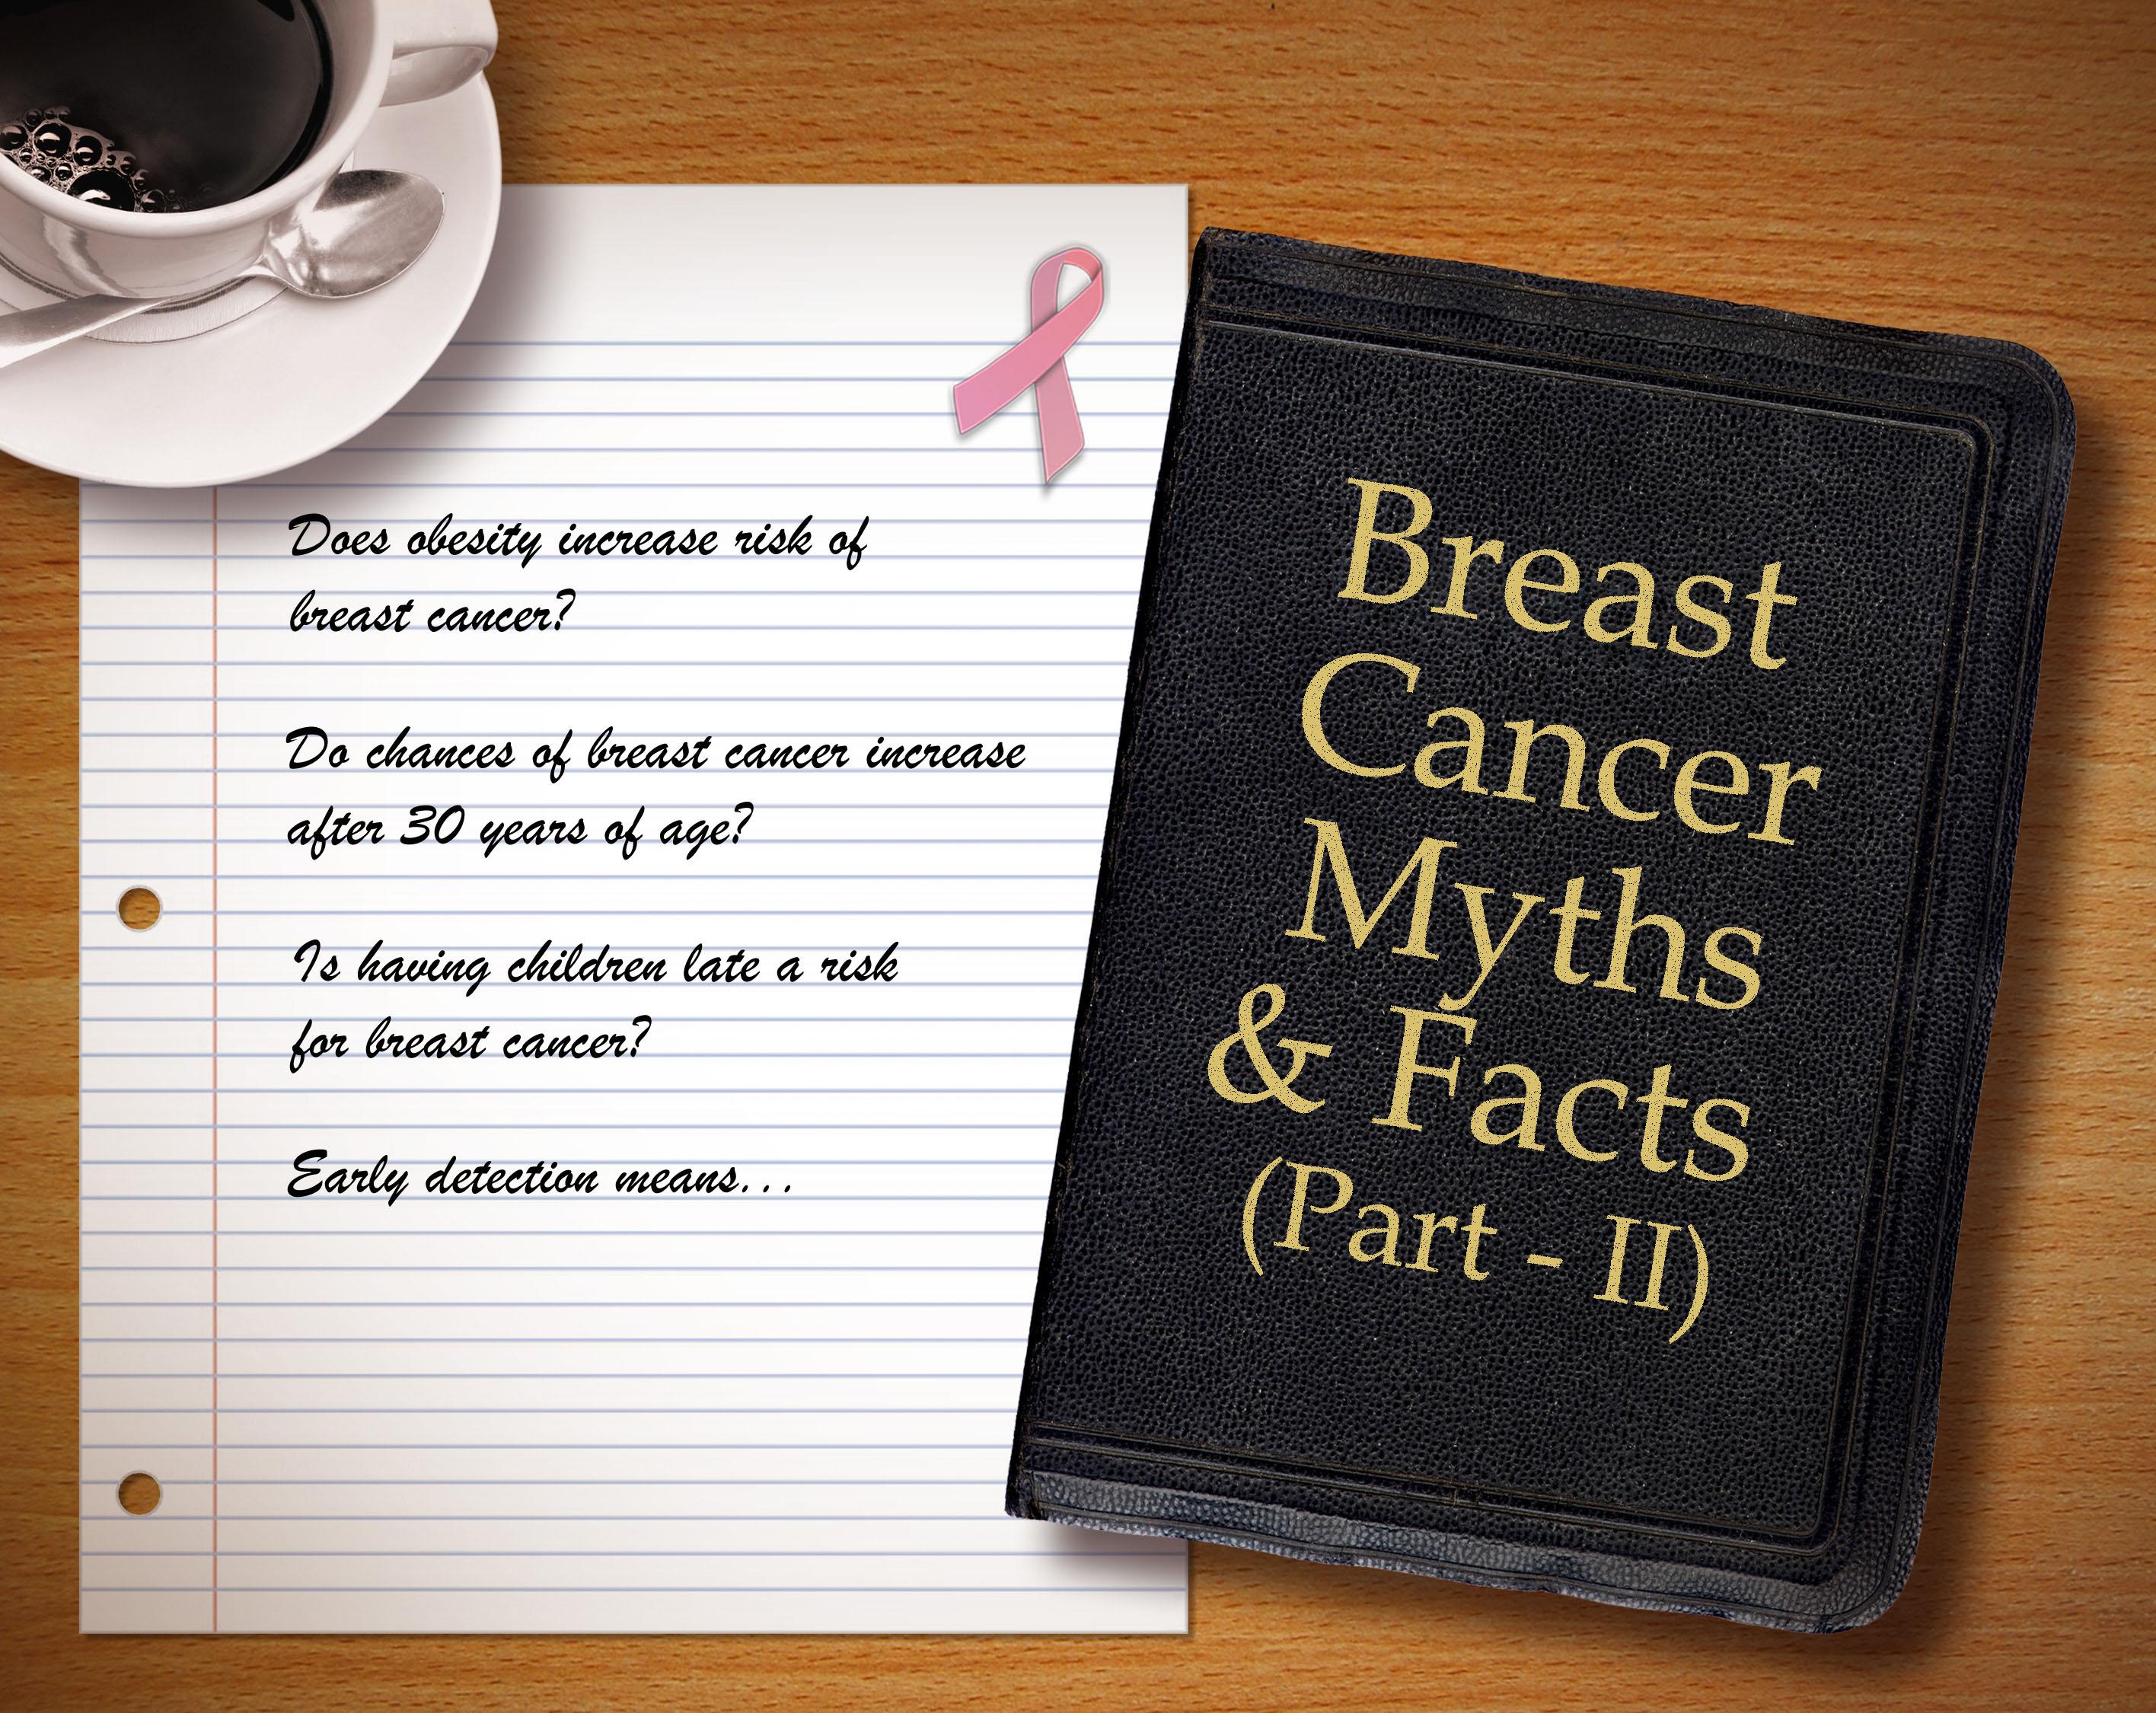 Breast-Cancer-Myths2